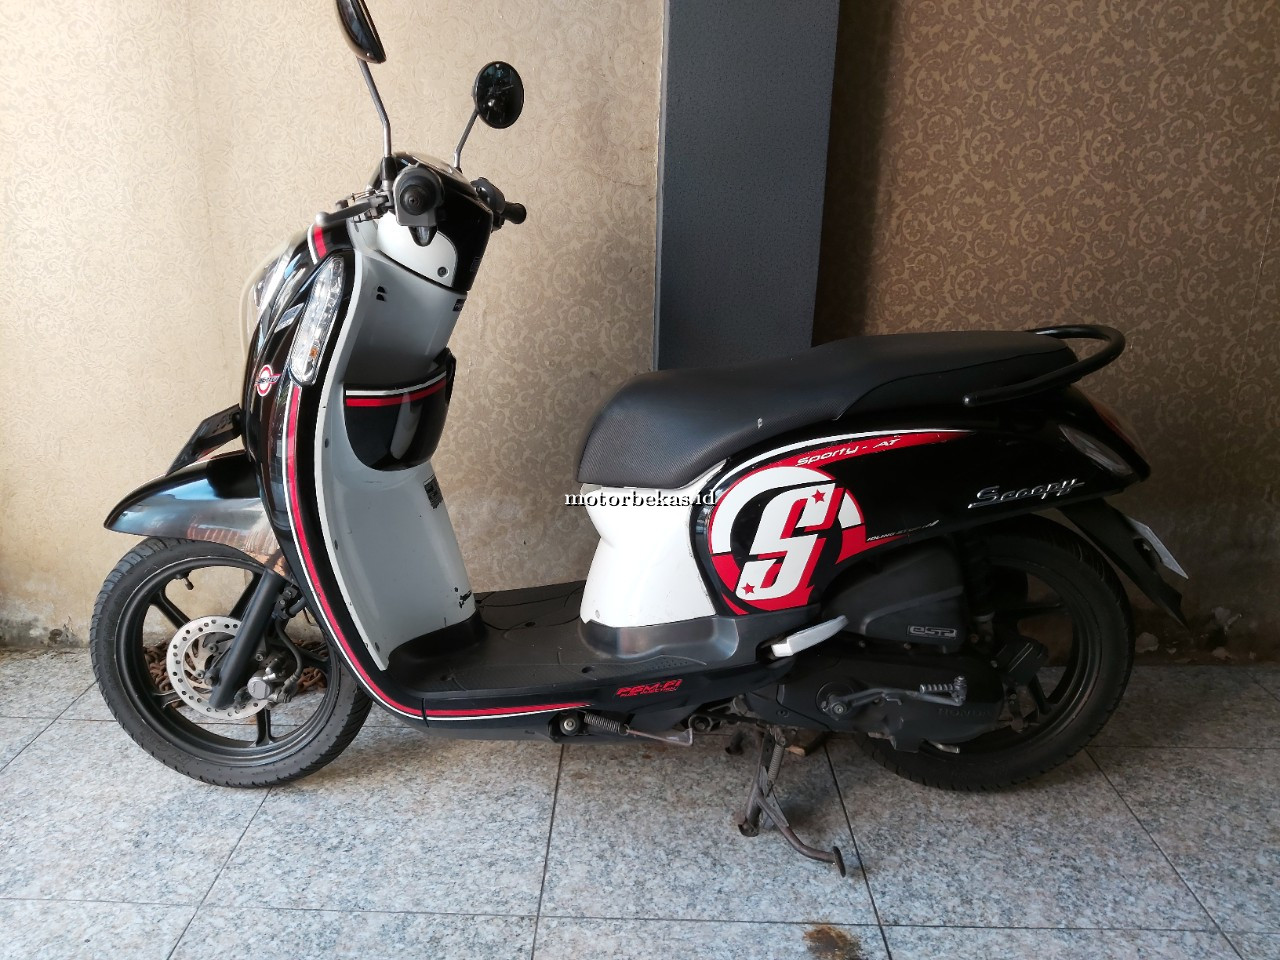 HONDA SCOOPY SPORTY FI 6 motorbekas.id